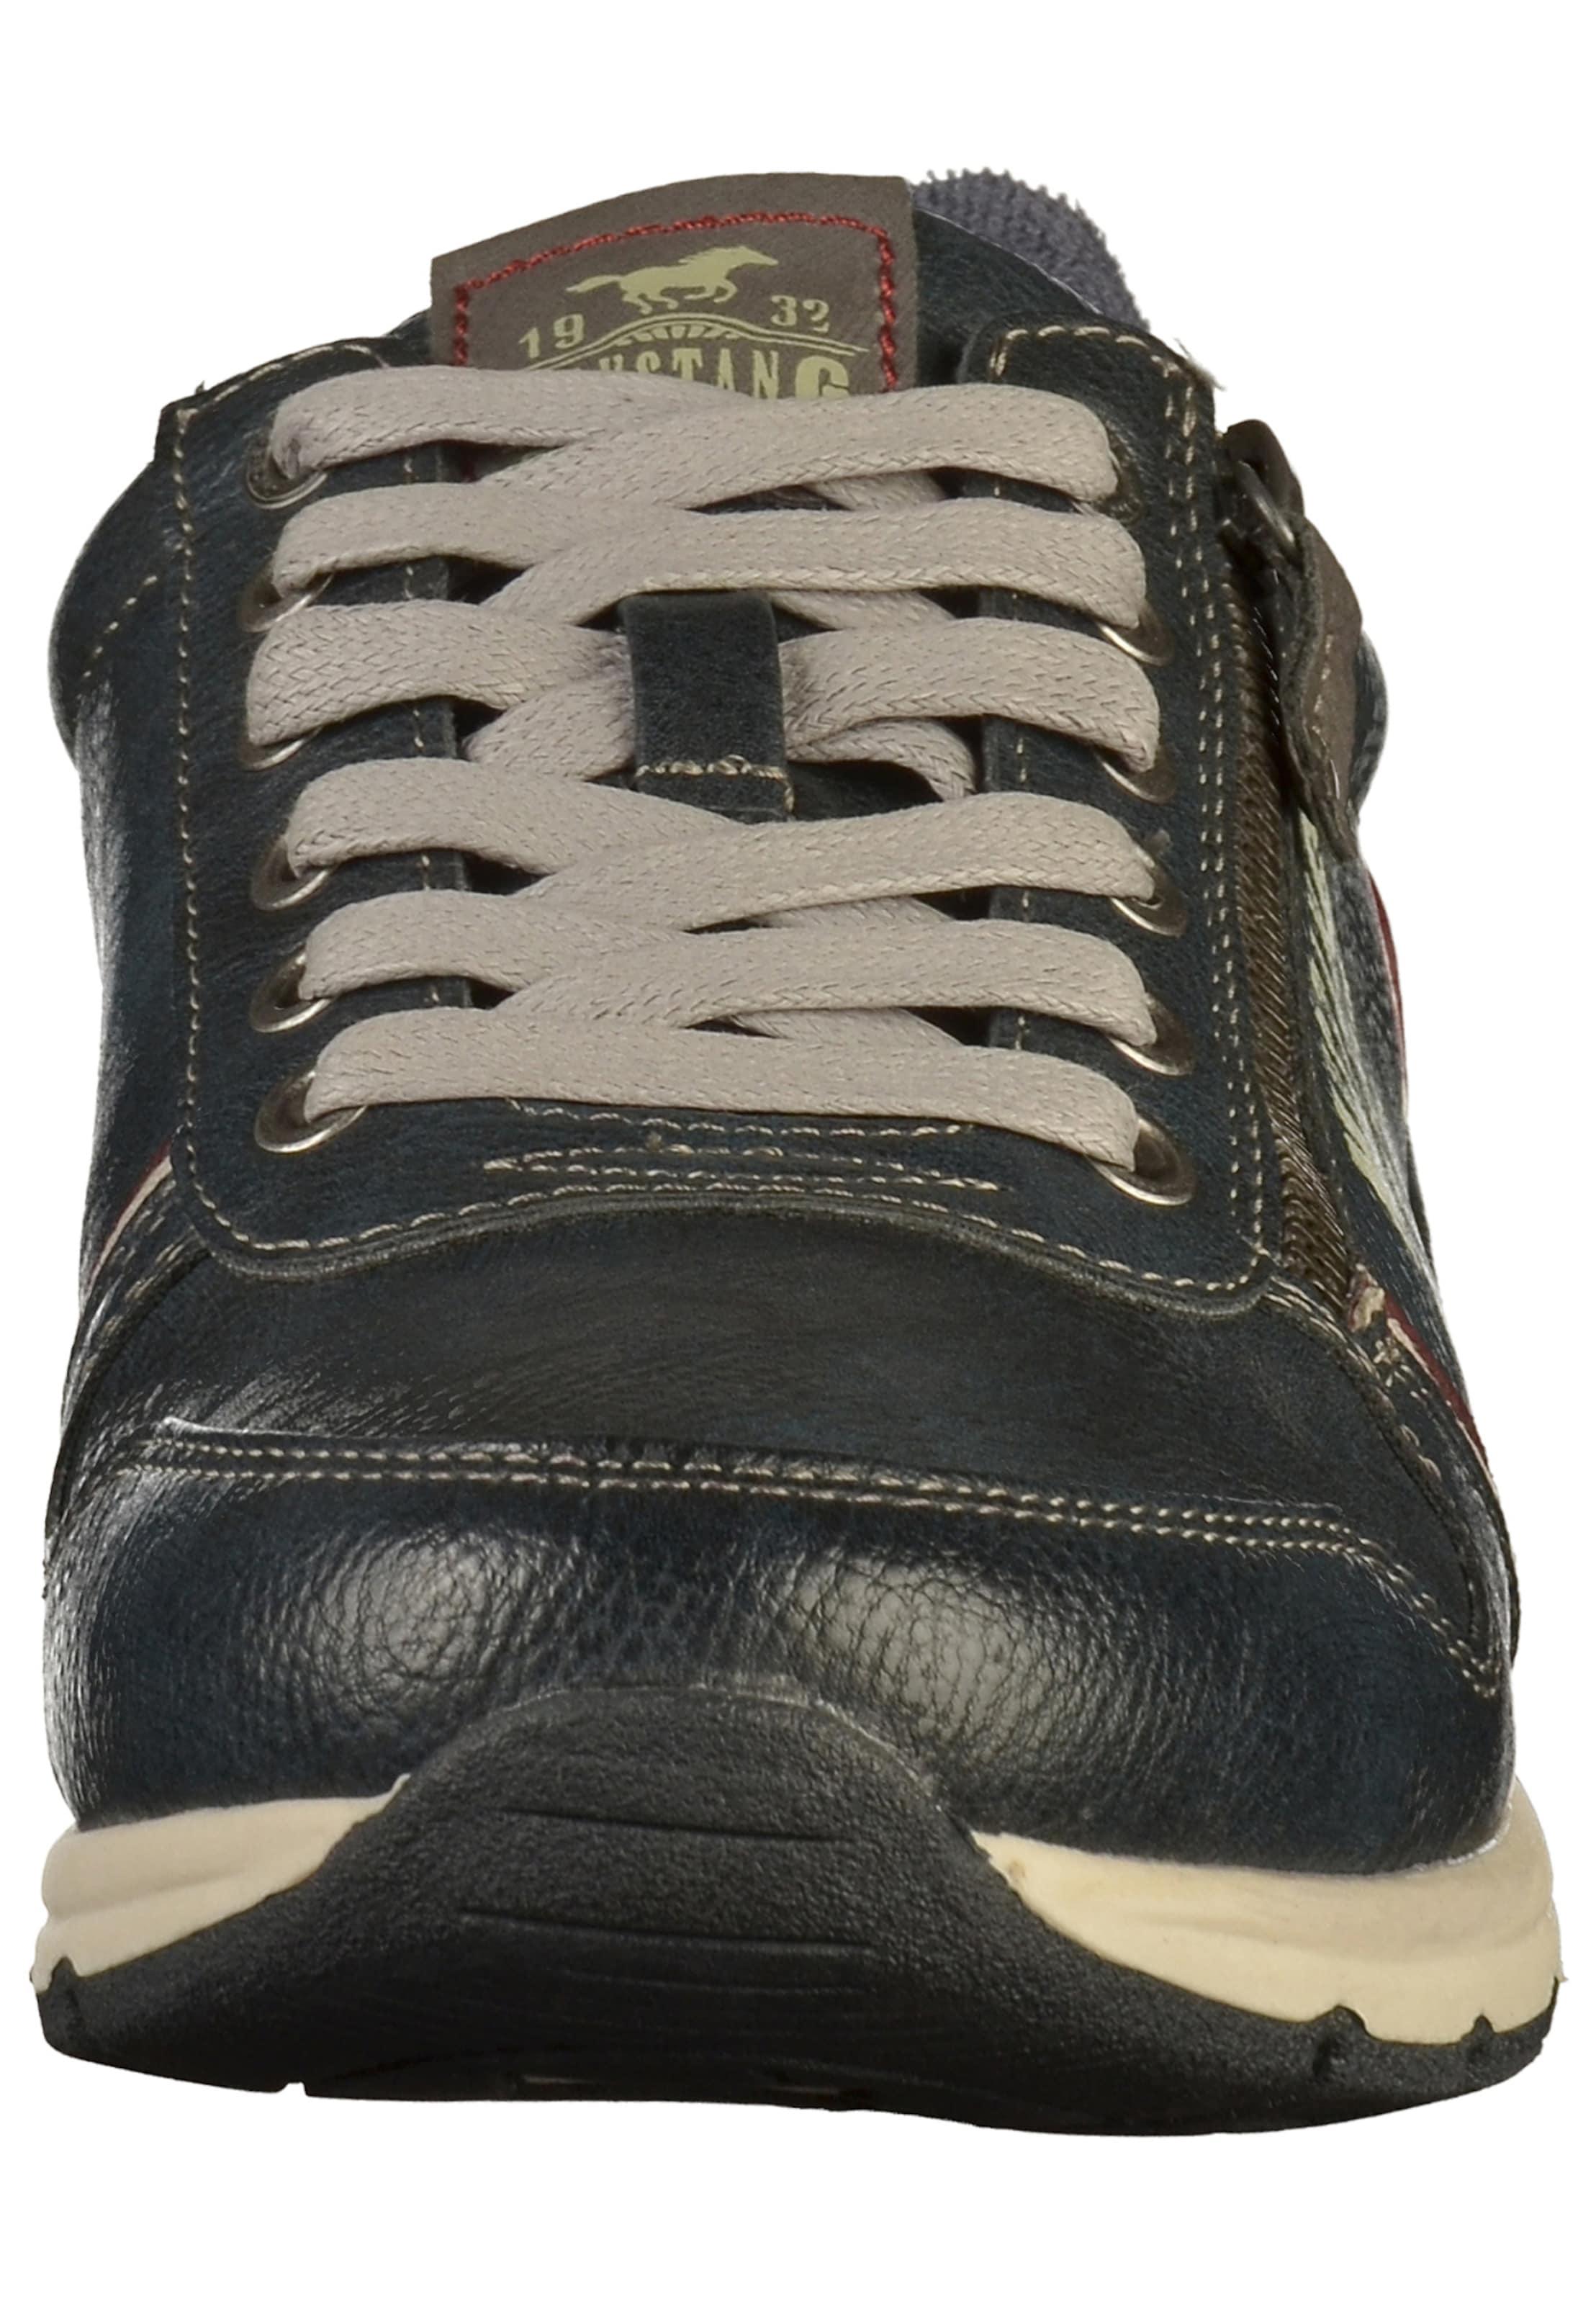 Sneaker In Sneaker In Mustang NavyBlutrot In NavyBlutrot Sneaker NavyBlutrot Mustang Mustang F1c3lKJuT